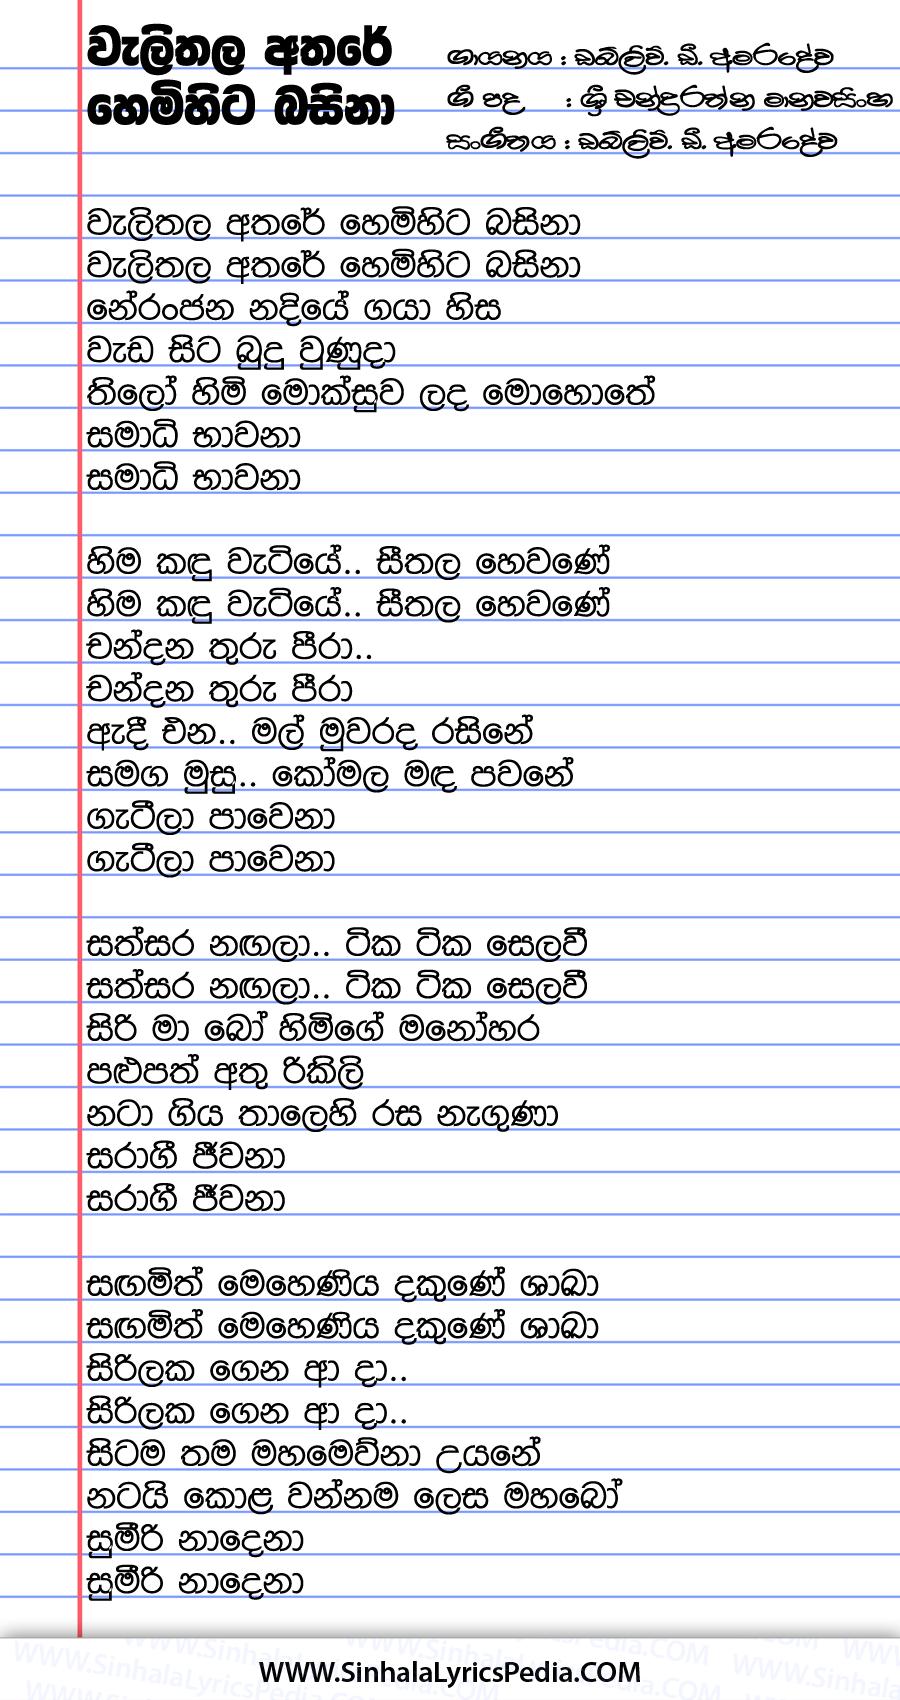 Wali Thala Athare Hemihita Basina Song Lyrics